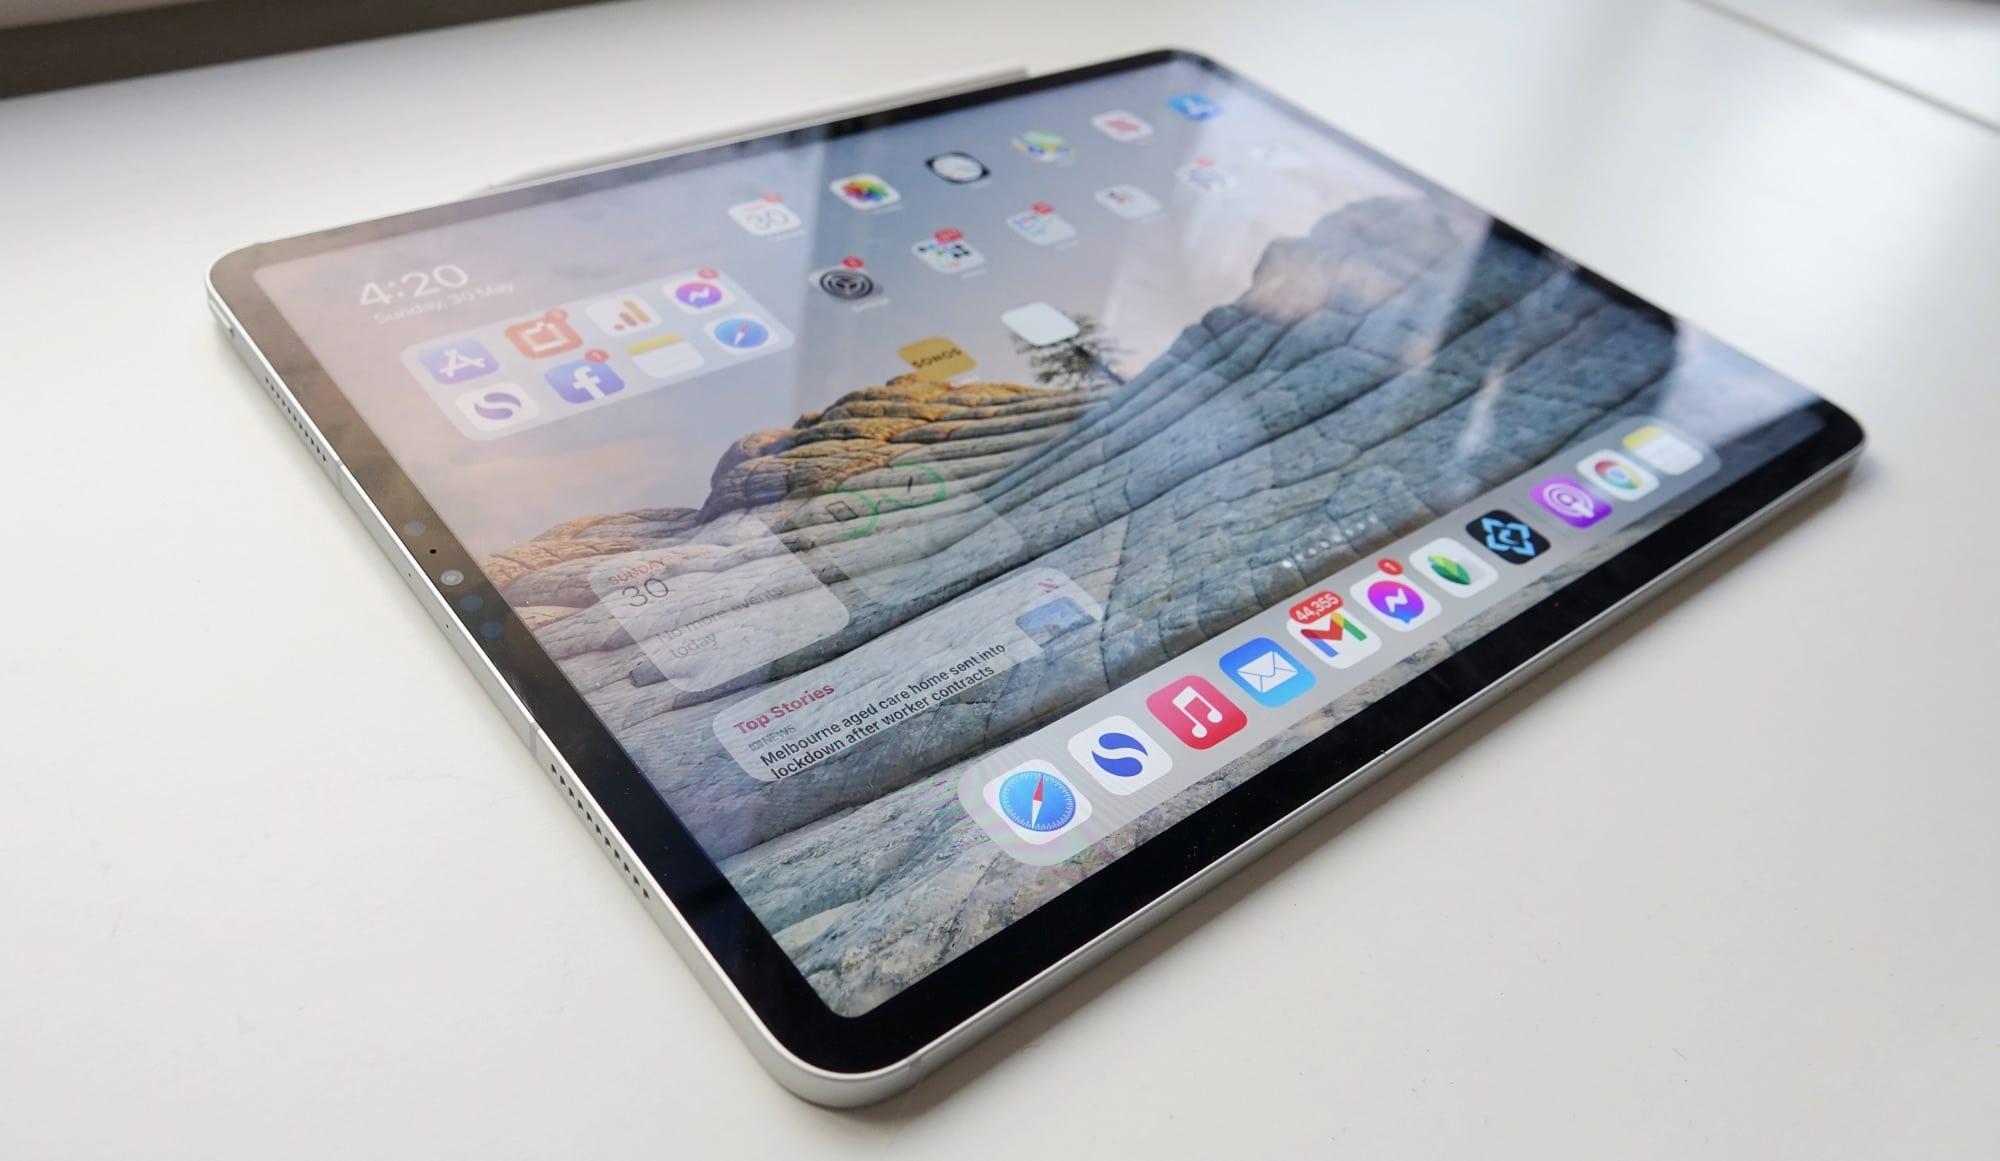 Apple iPad Pro 12.9 2021 reviewed